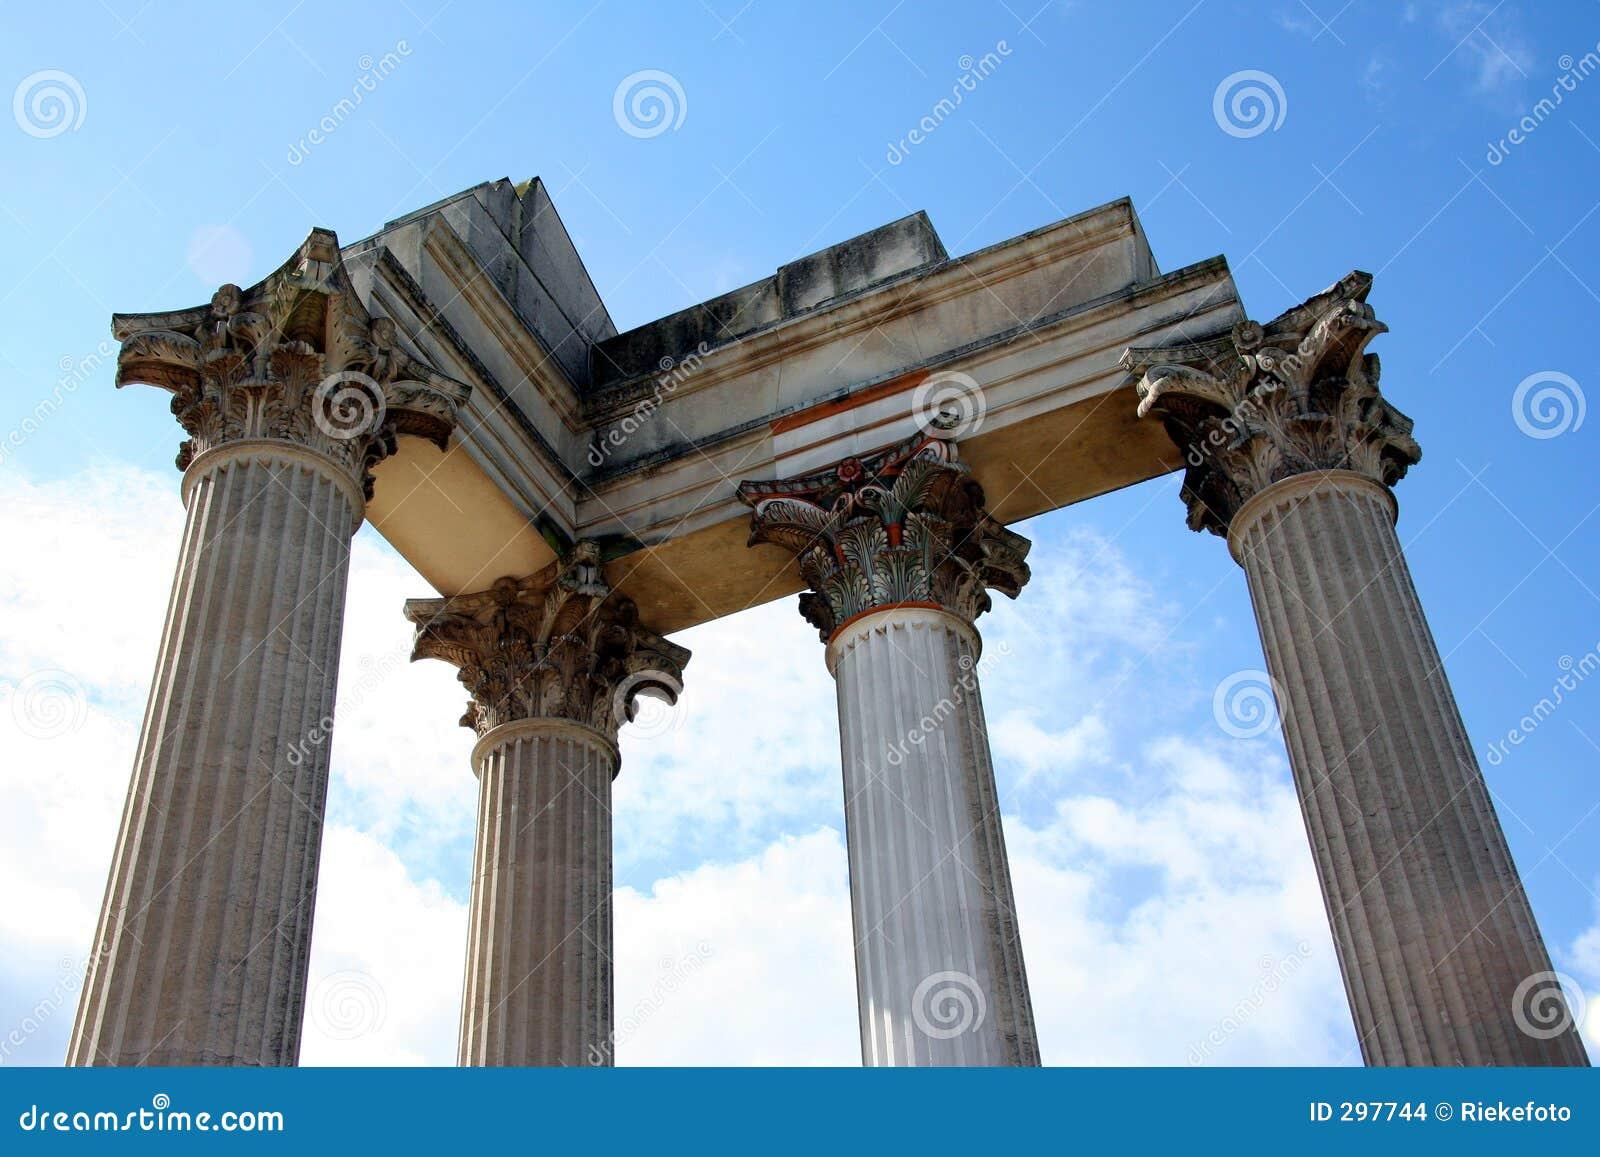 Roman Harbor Temple Stock Images - Image: 297744